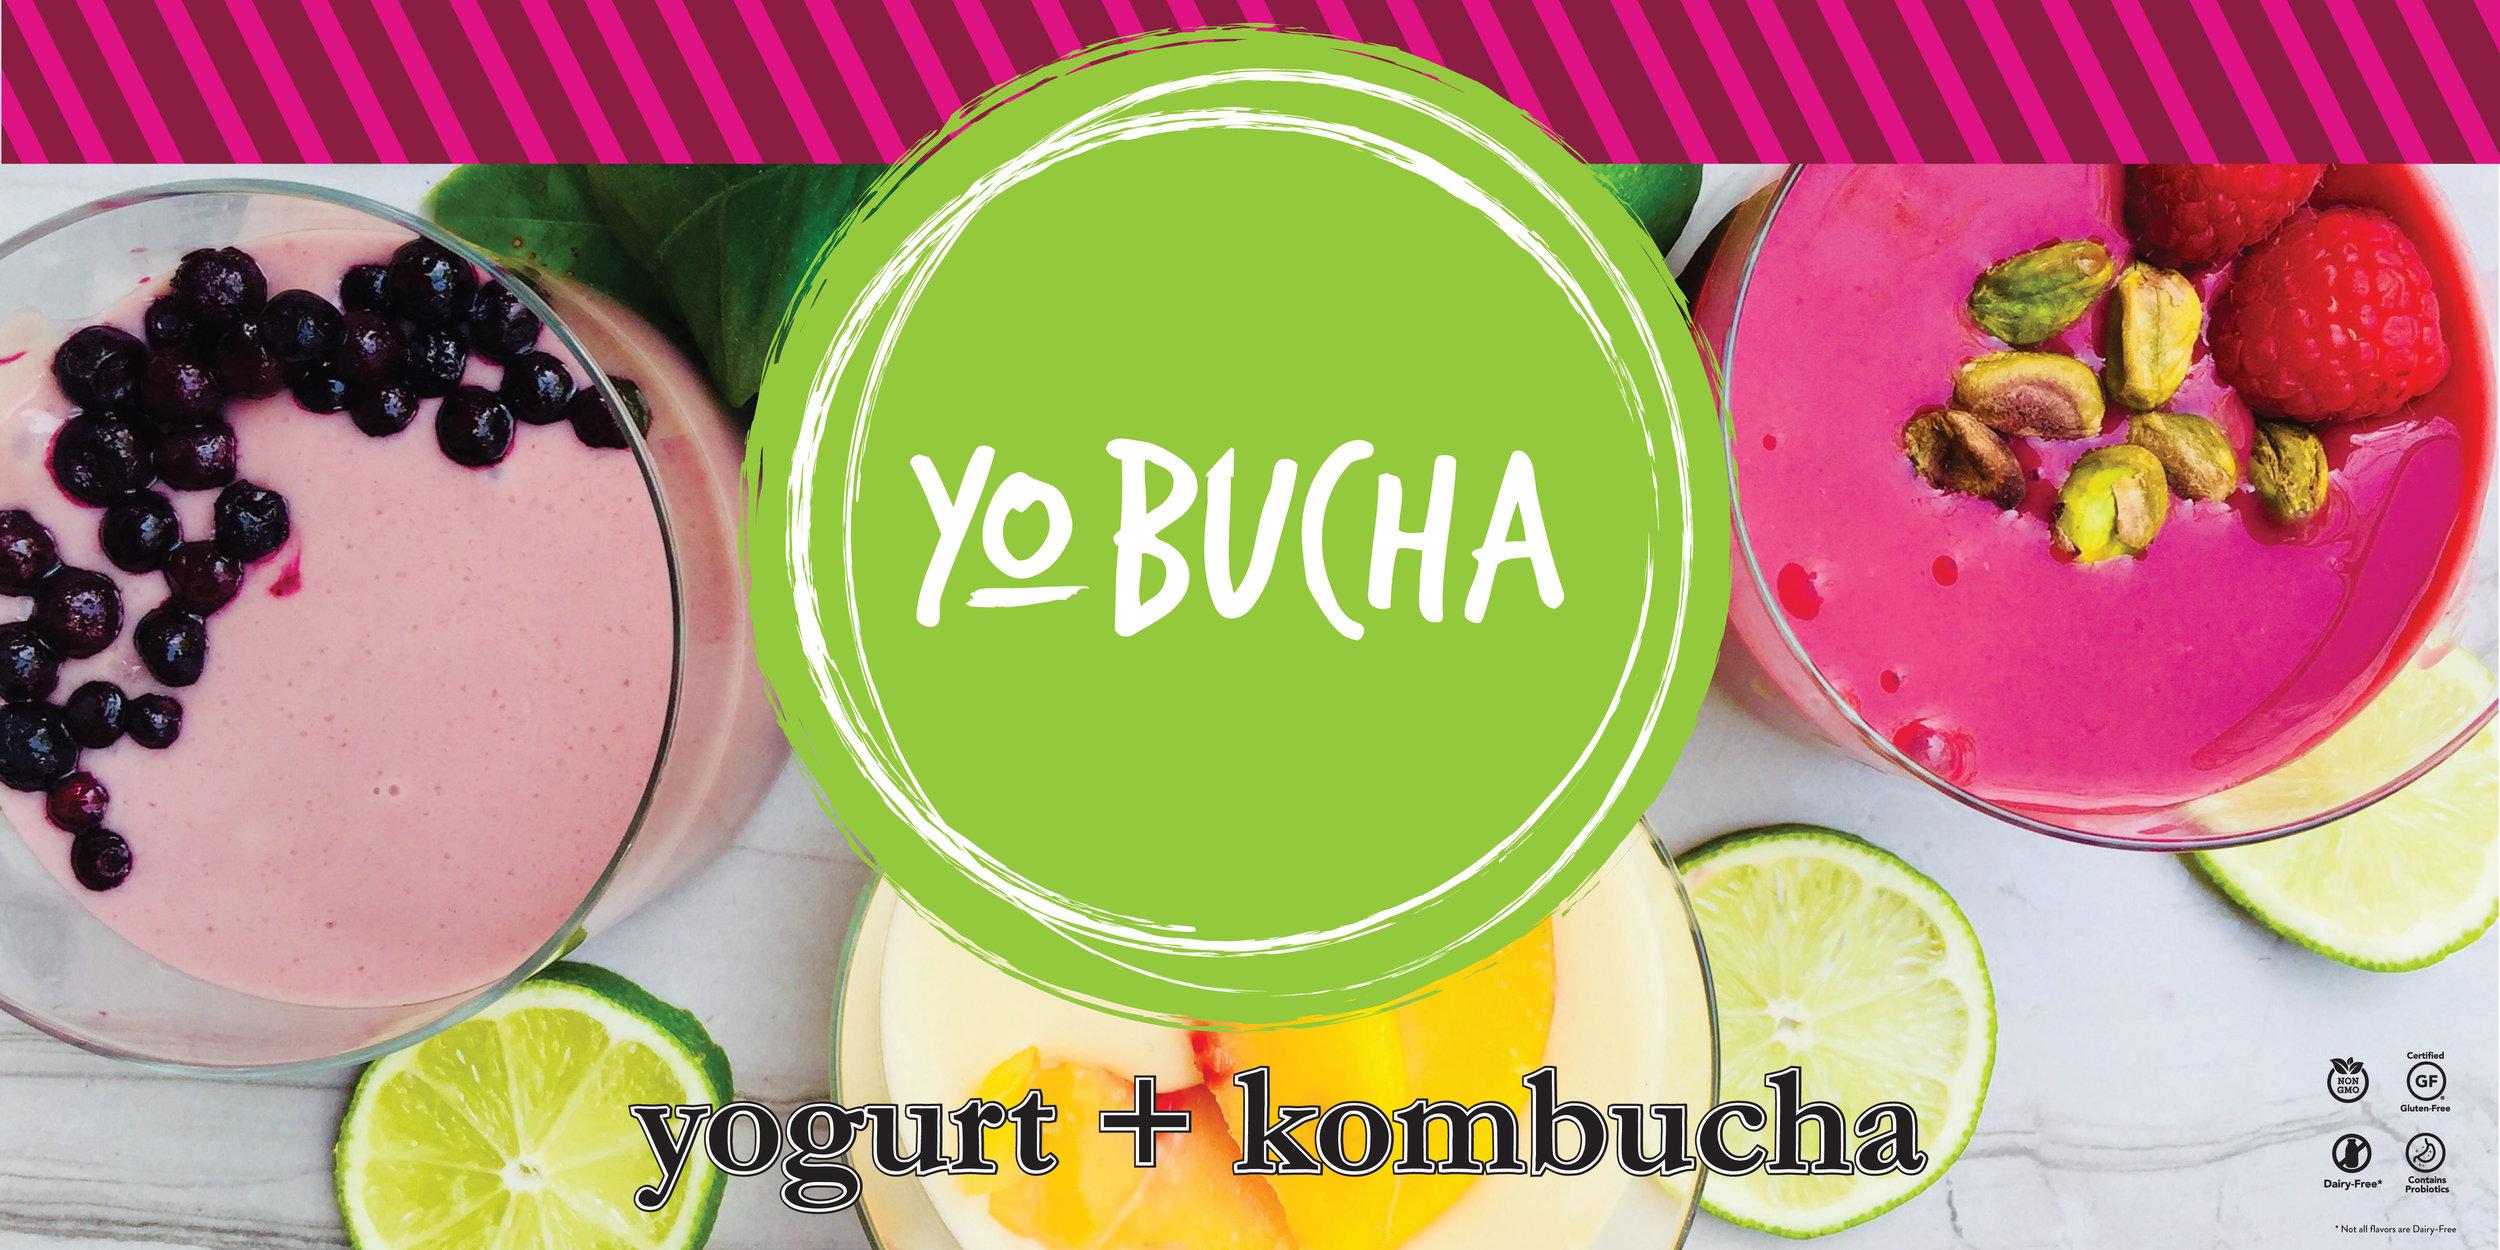 YoBuchaBanner.jpg